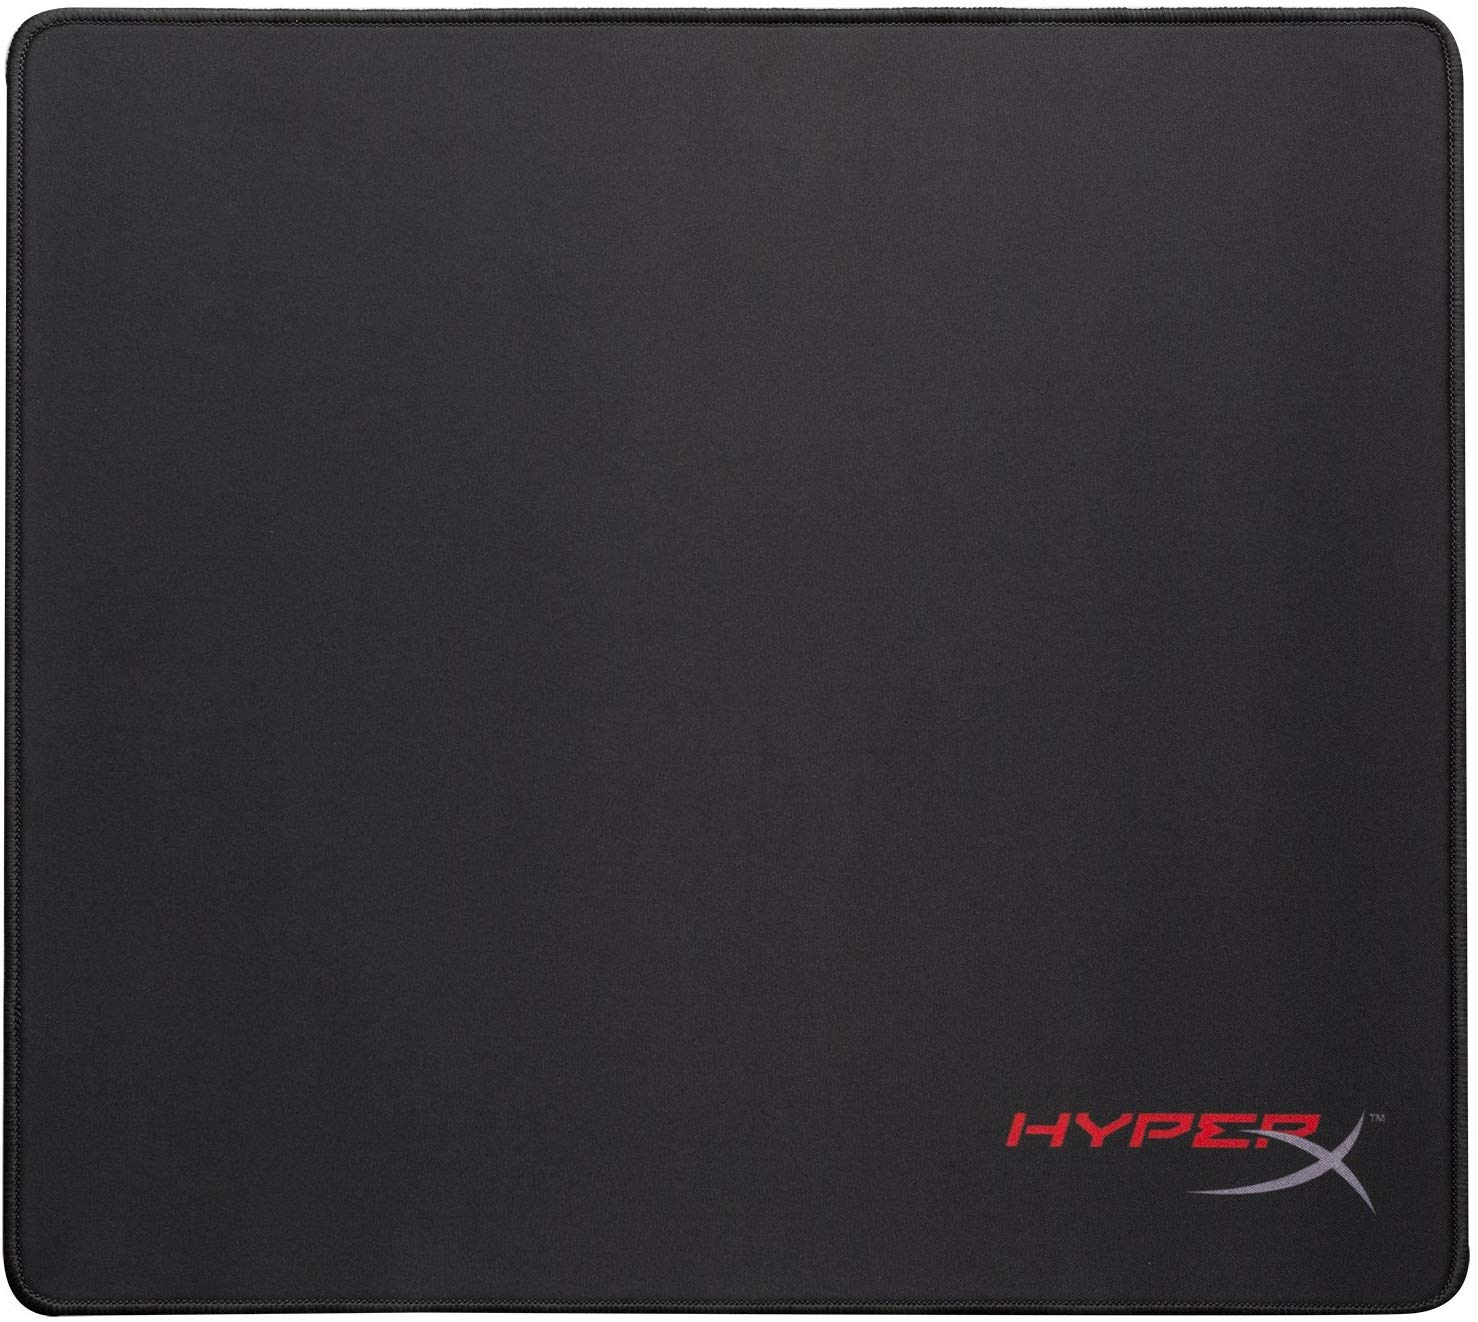 HyperX FURY S - Pro